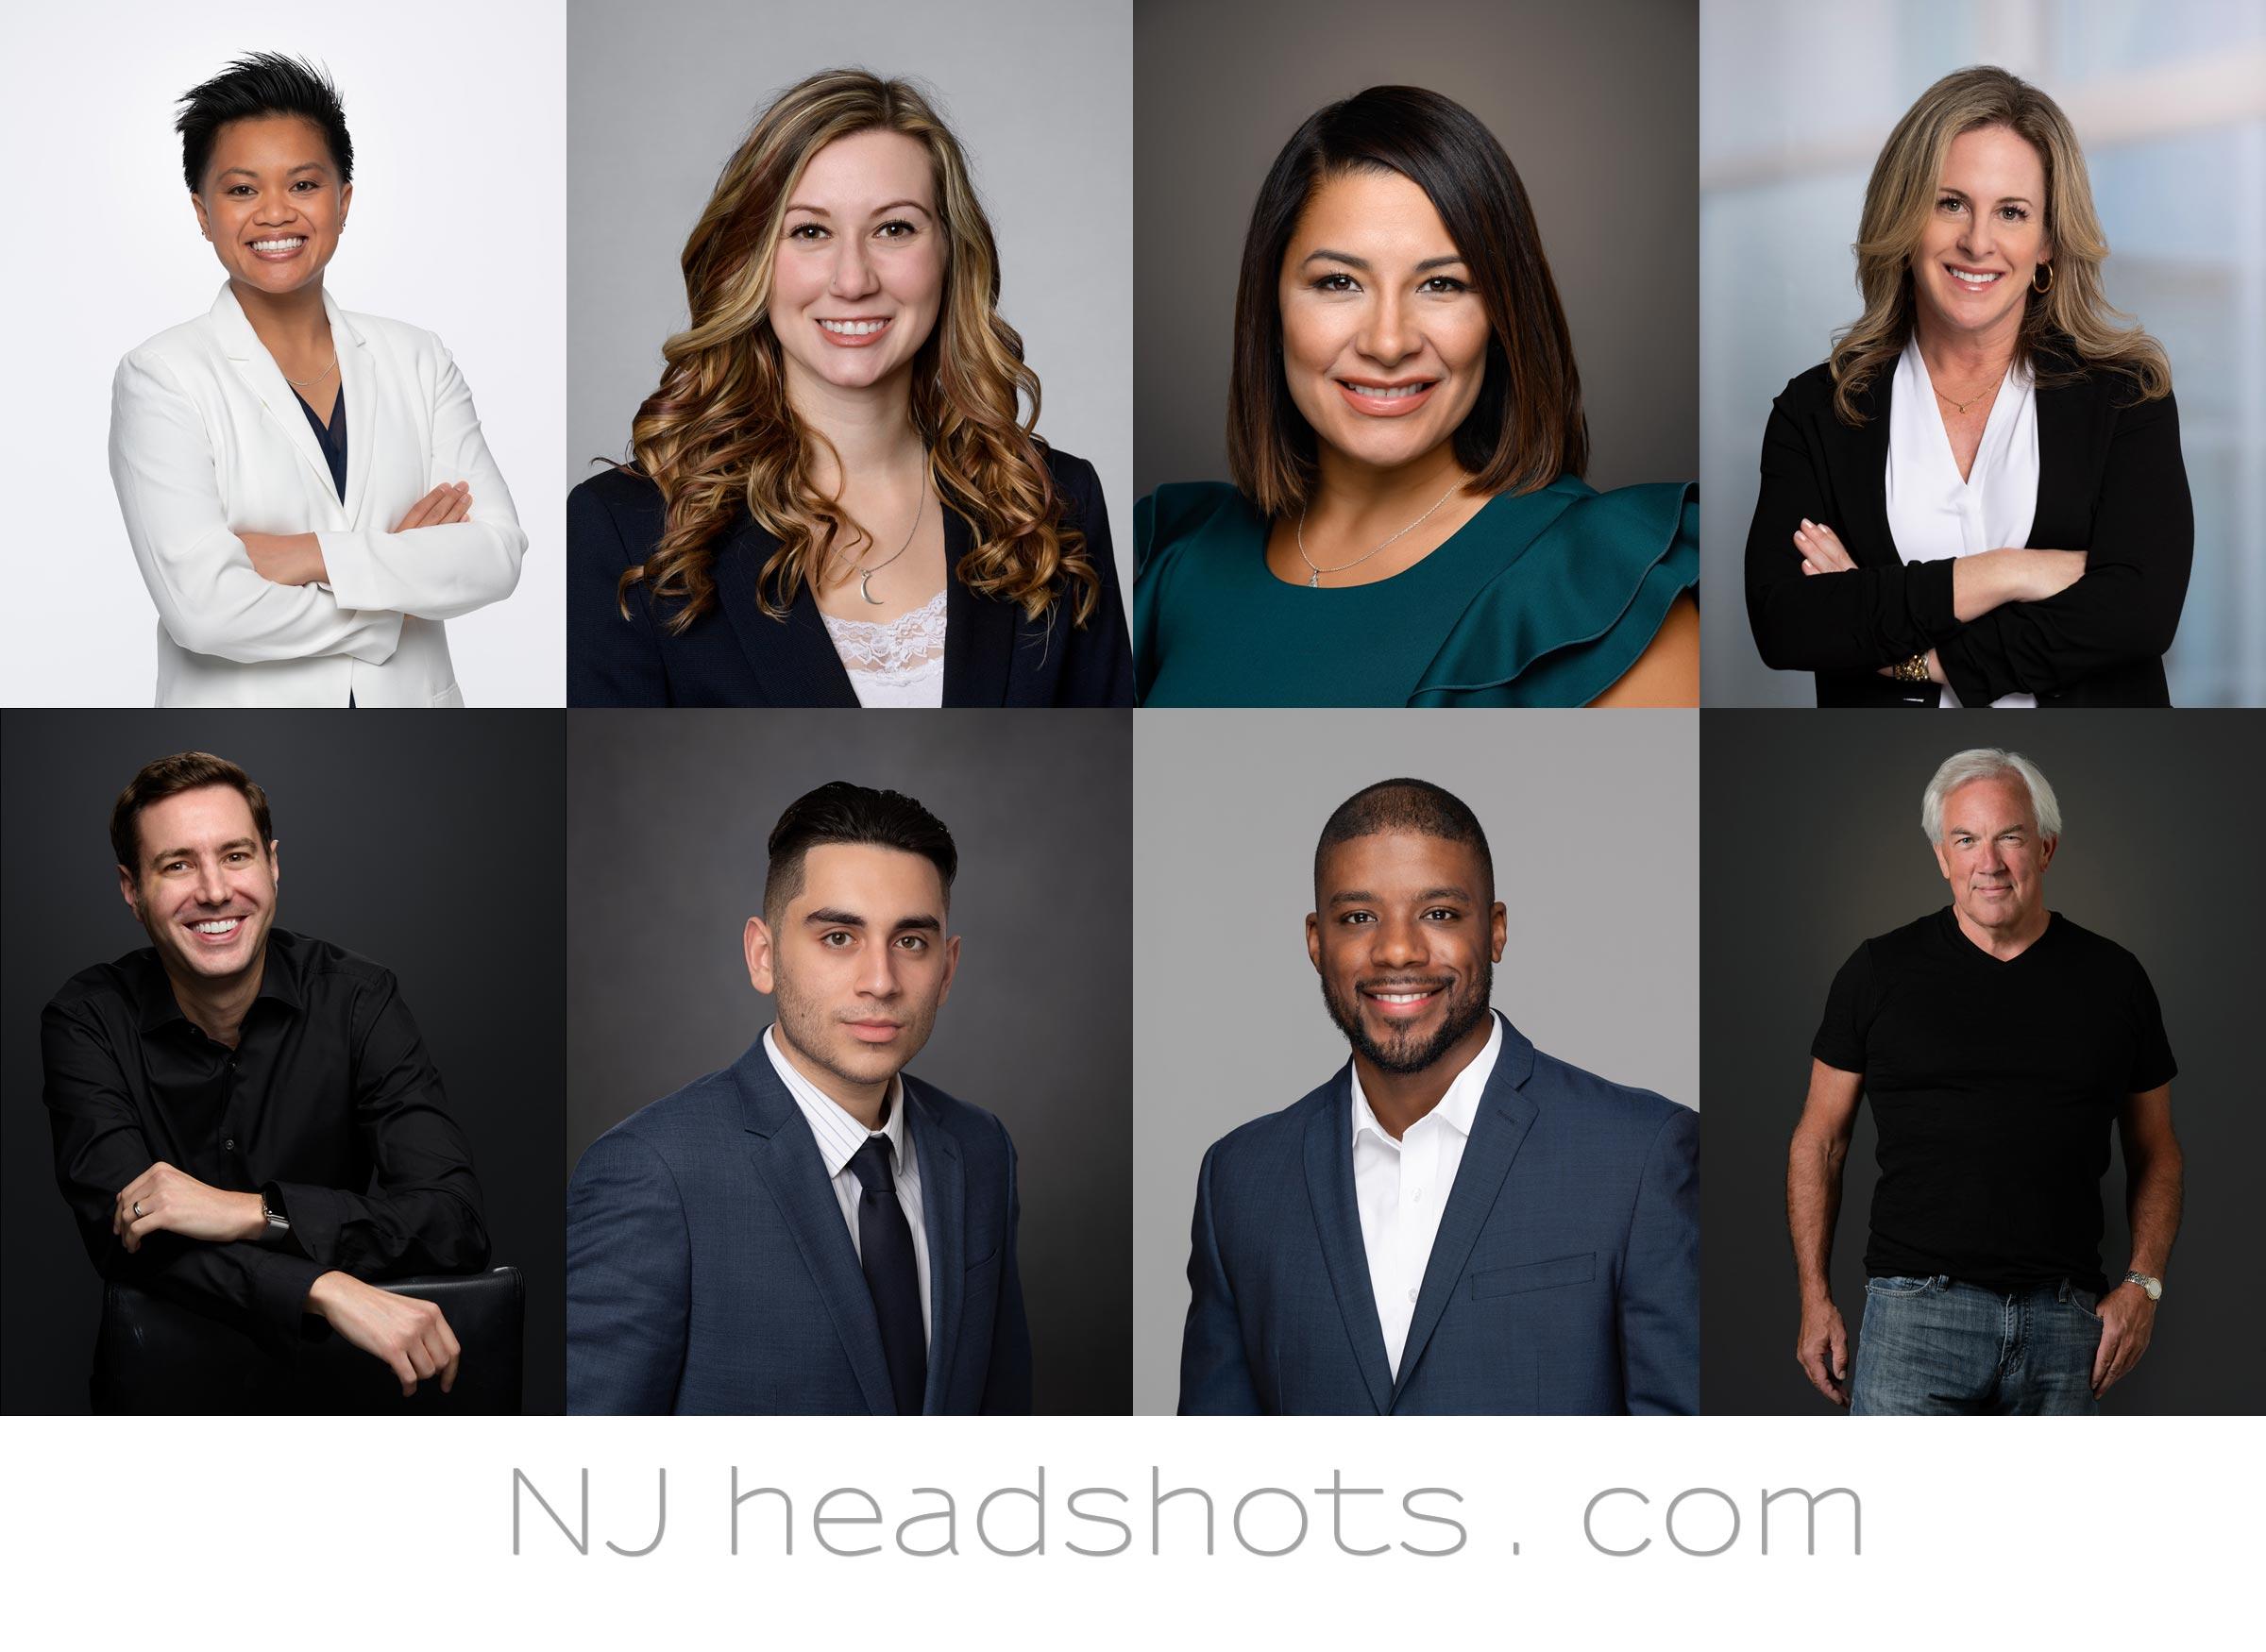 NJ headshot photographer testimonials